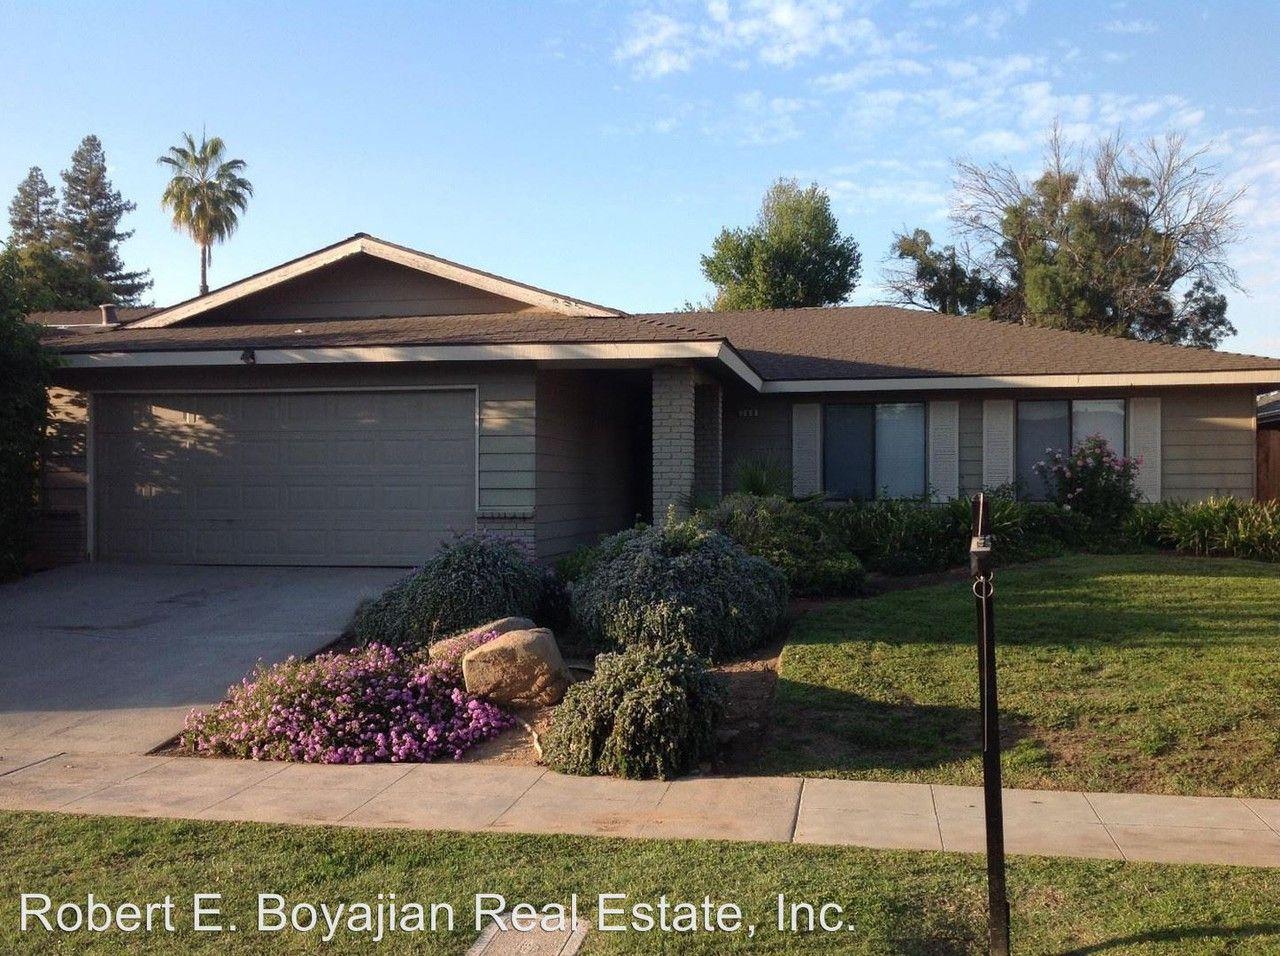 160 W Muncie Fresno Ca 93711 3 Bedroom House For Rent